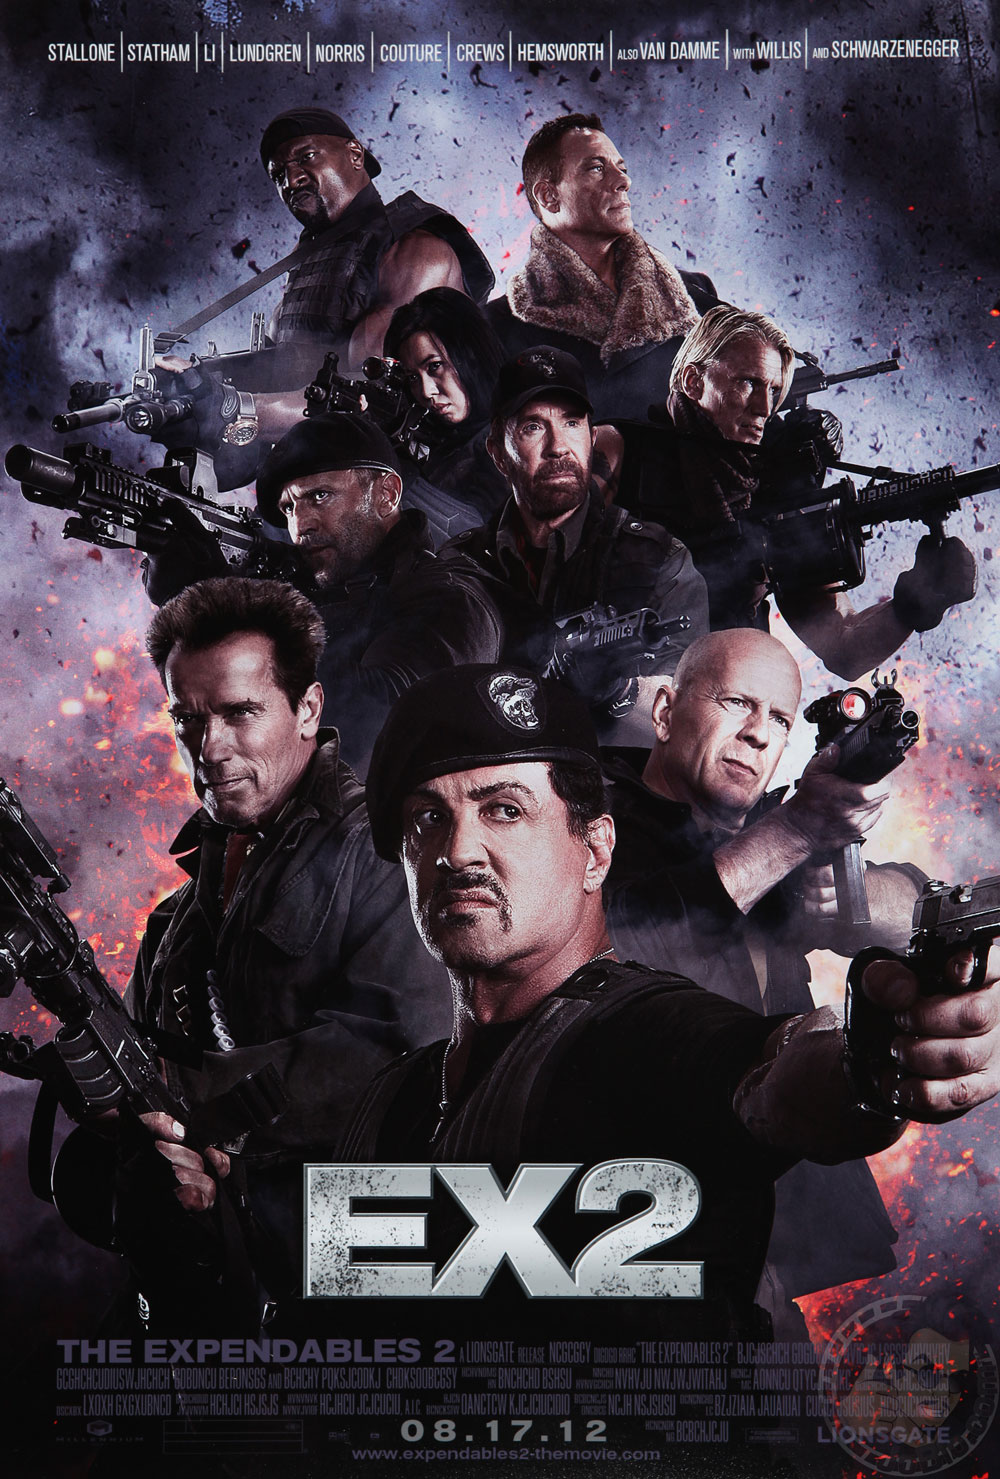 The Expendables 2 - Movie Poster #2 (Original)